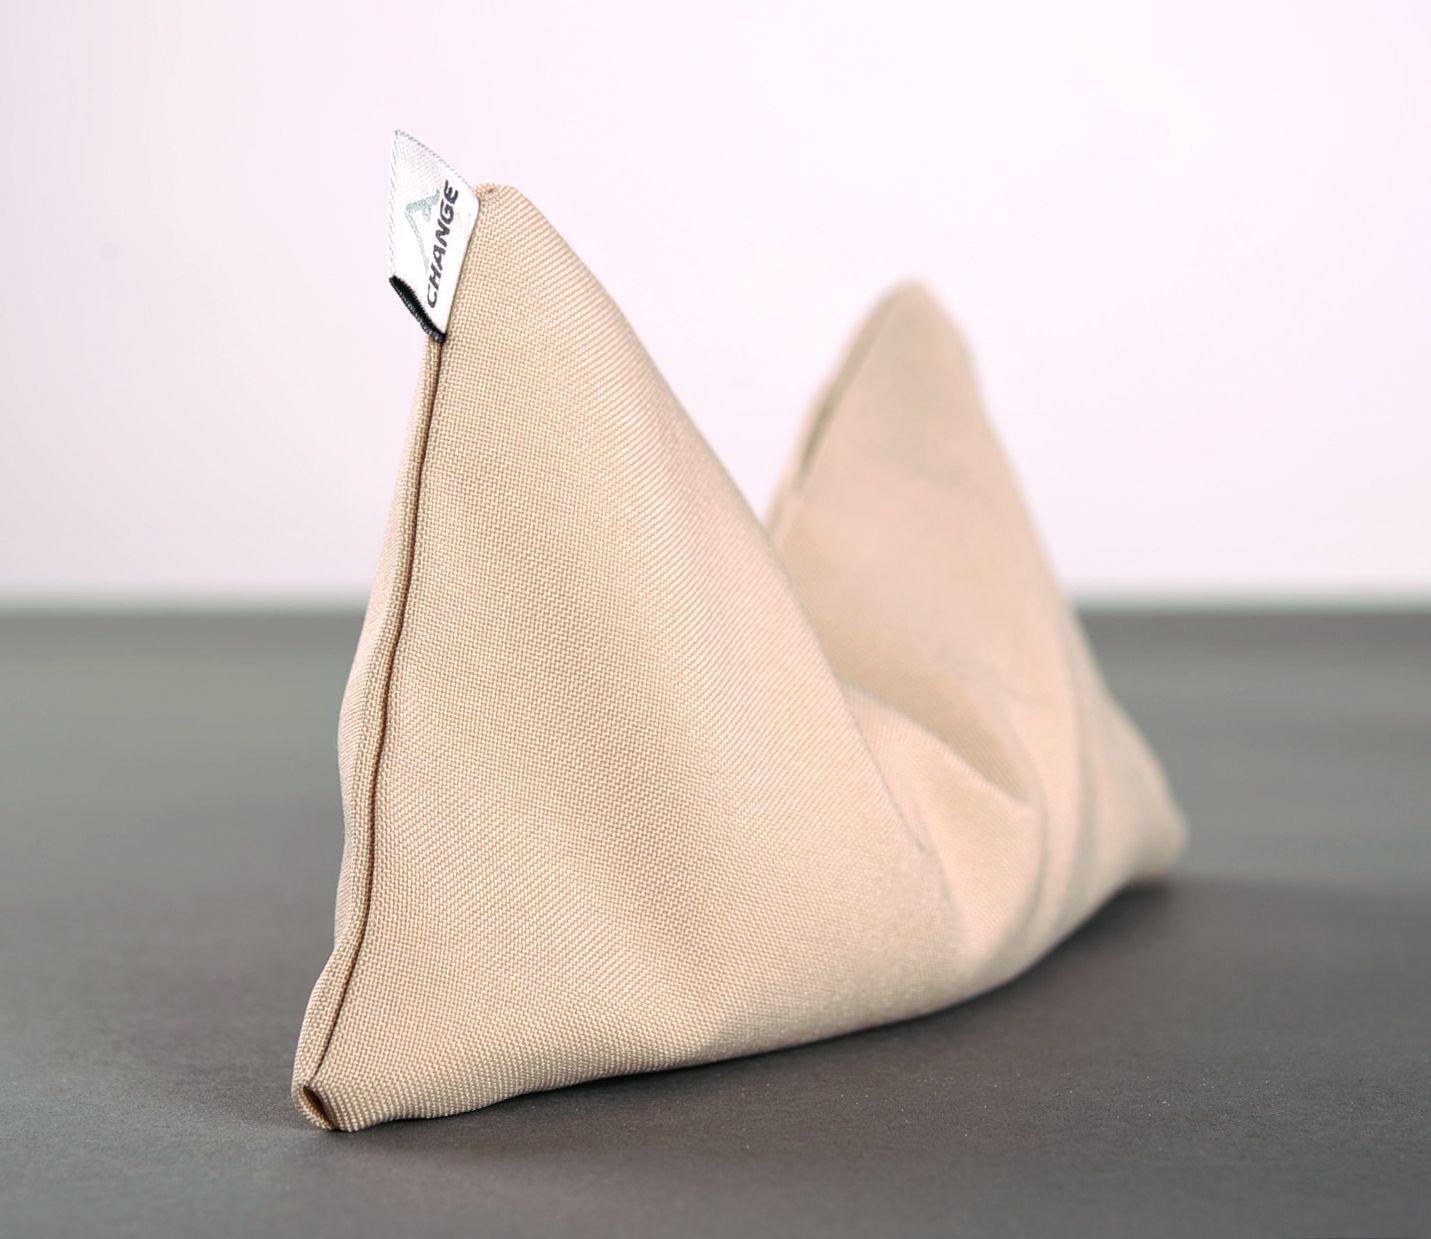 Yoga pillow with quartz sand photo 5